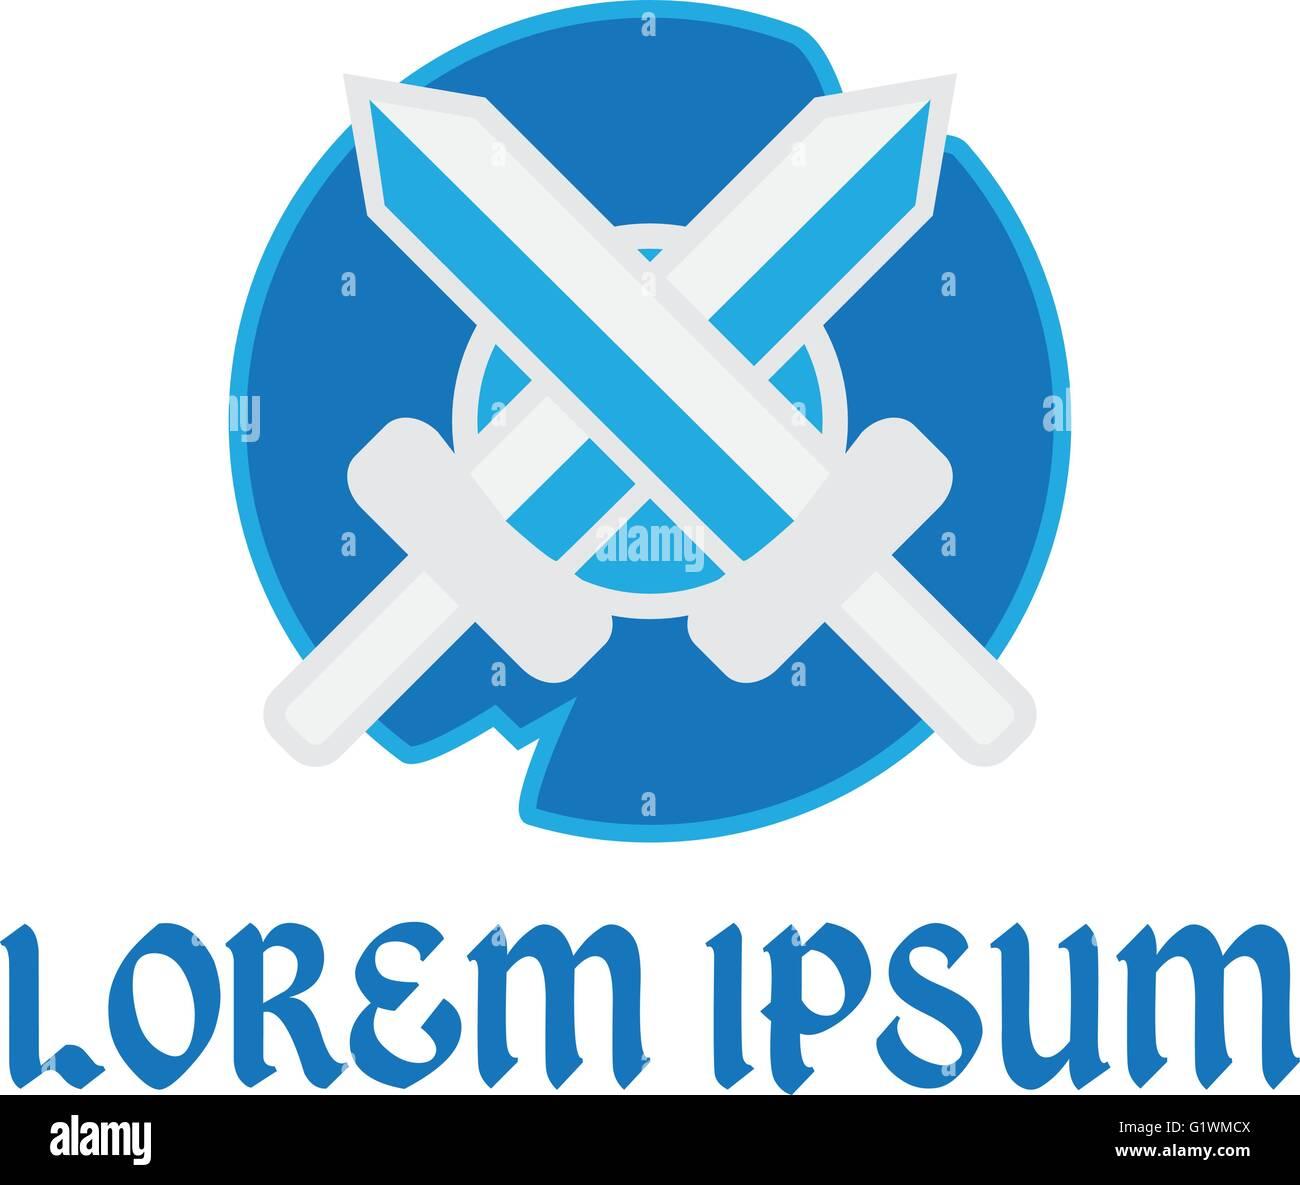 Retro sword and shield logo template logo vector design, company ...